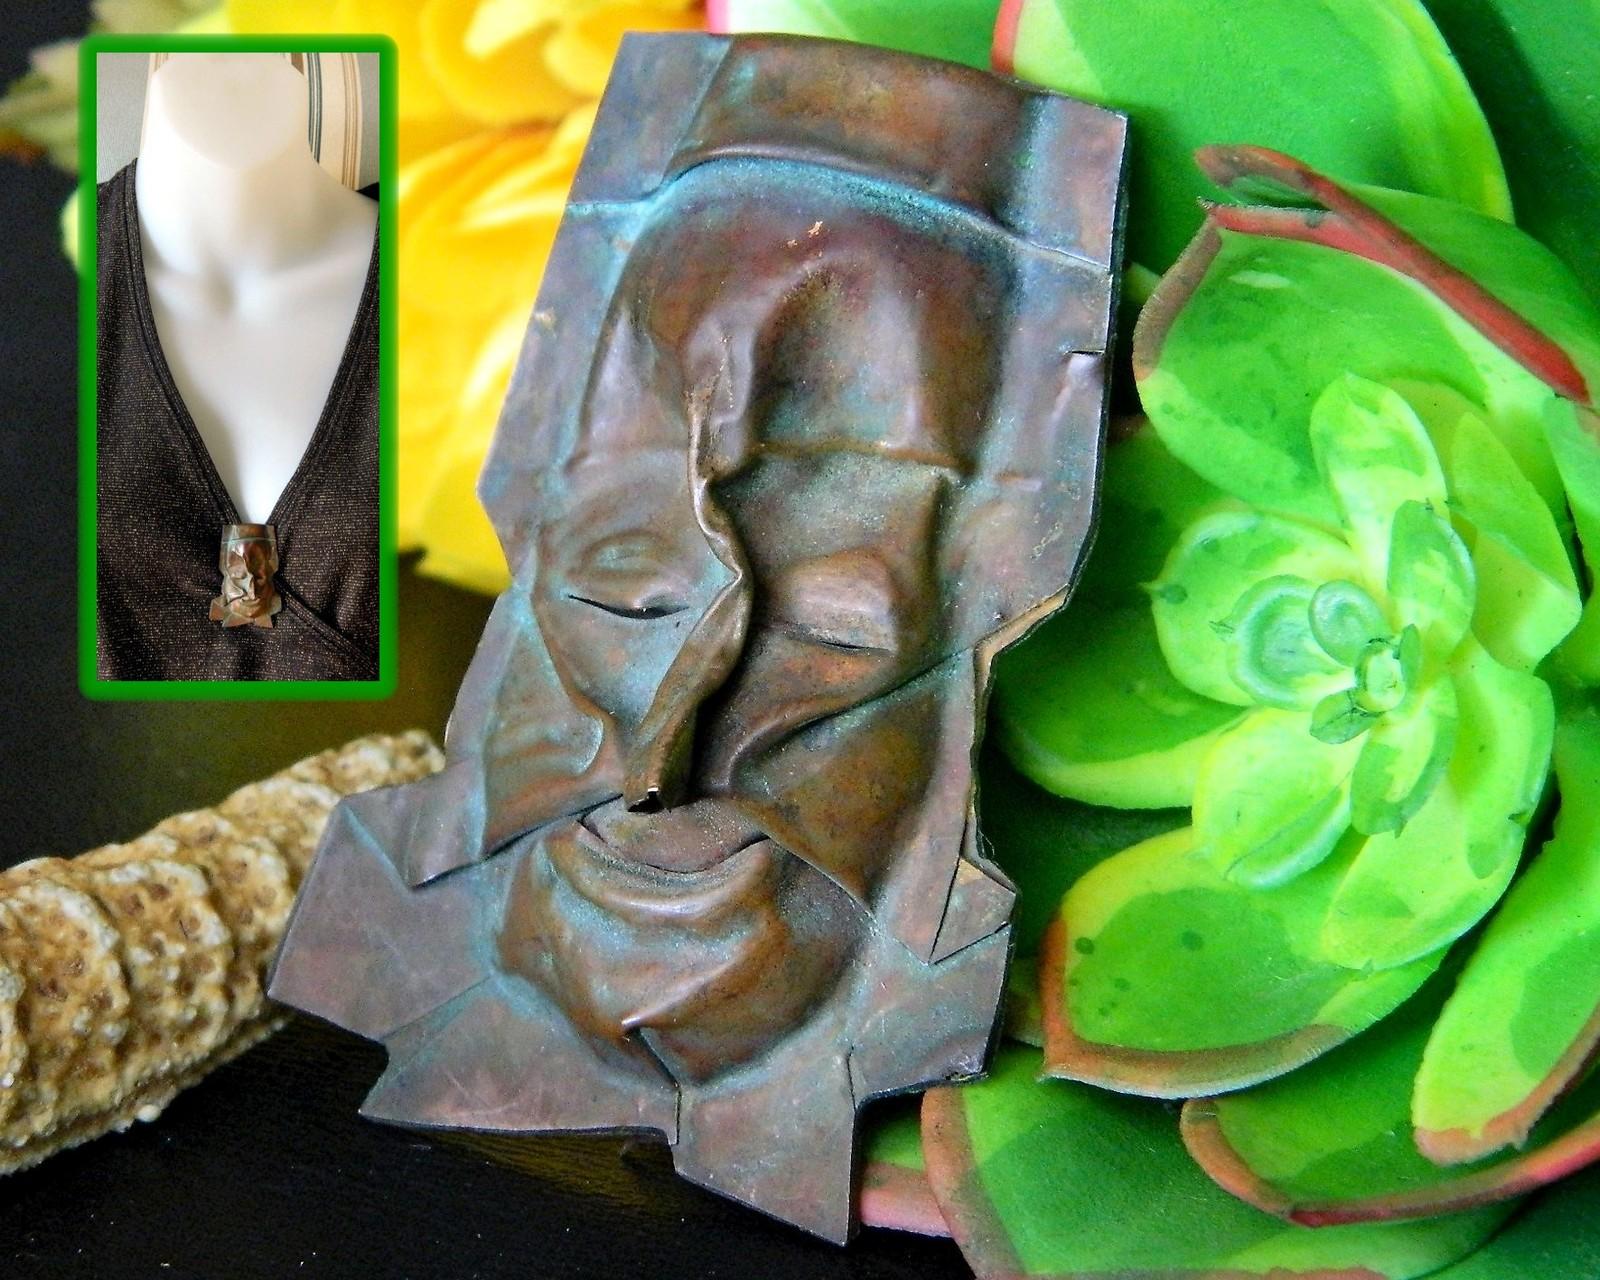 Vintage face pin brooch copper metal artisan handcrafted figural ooak